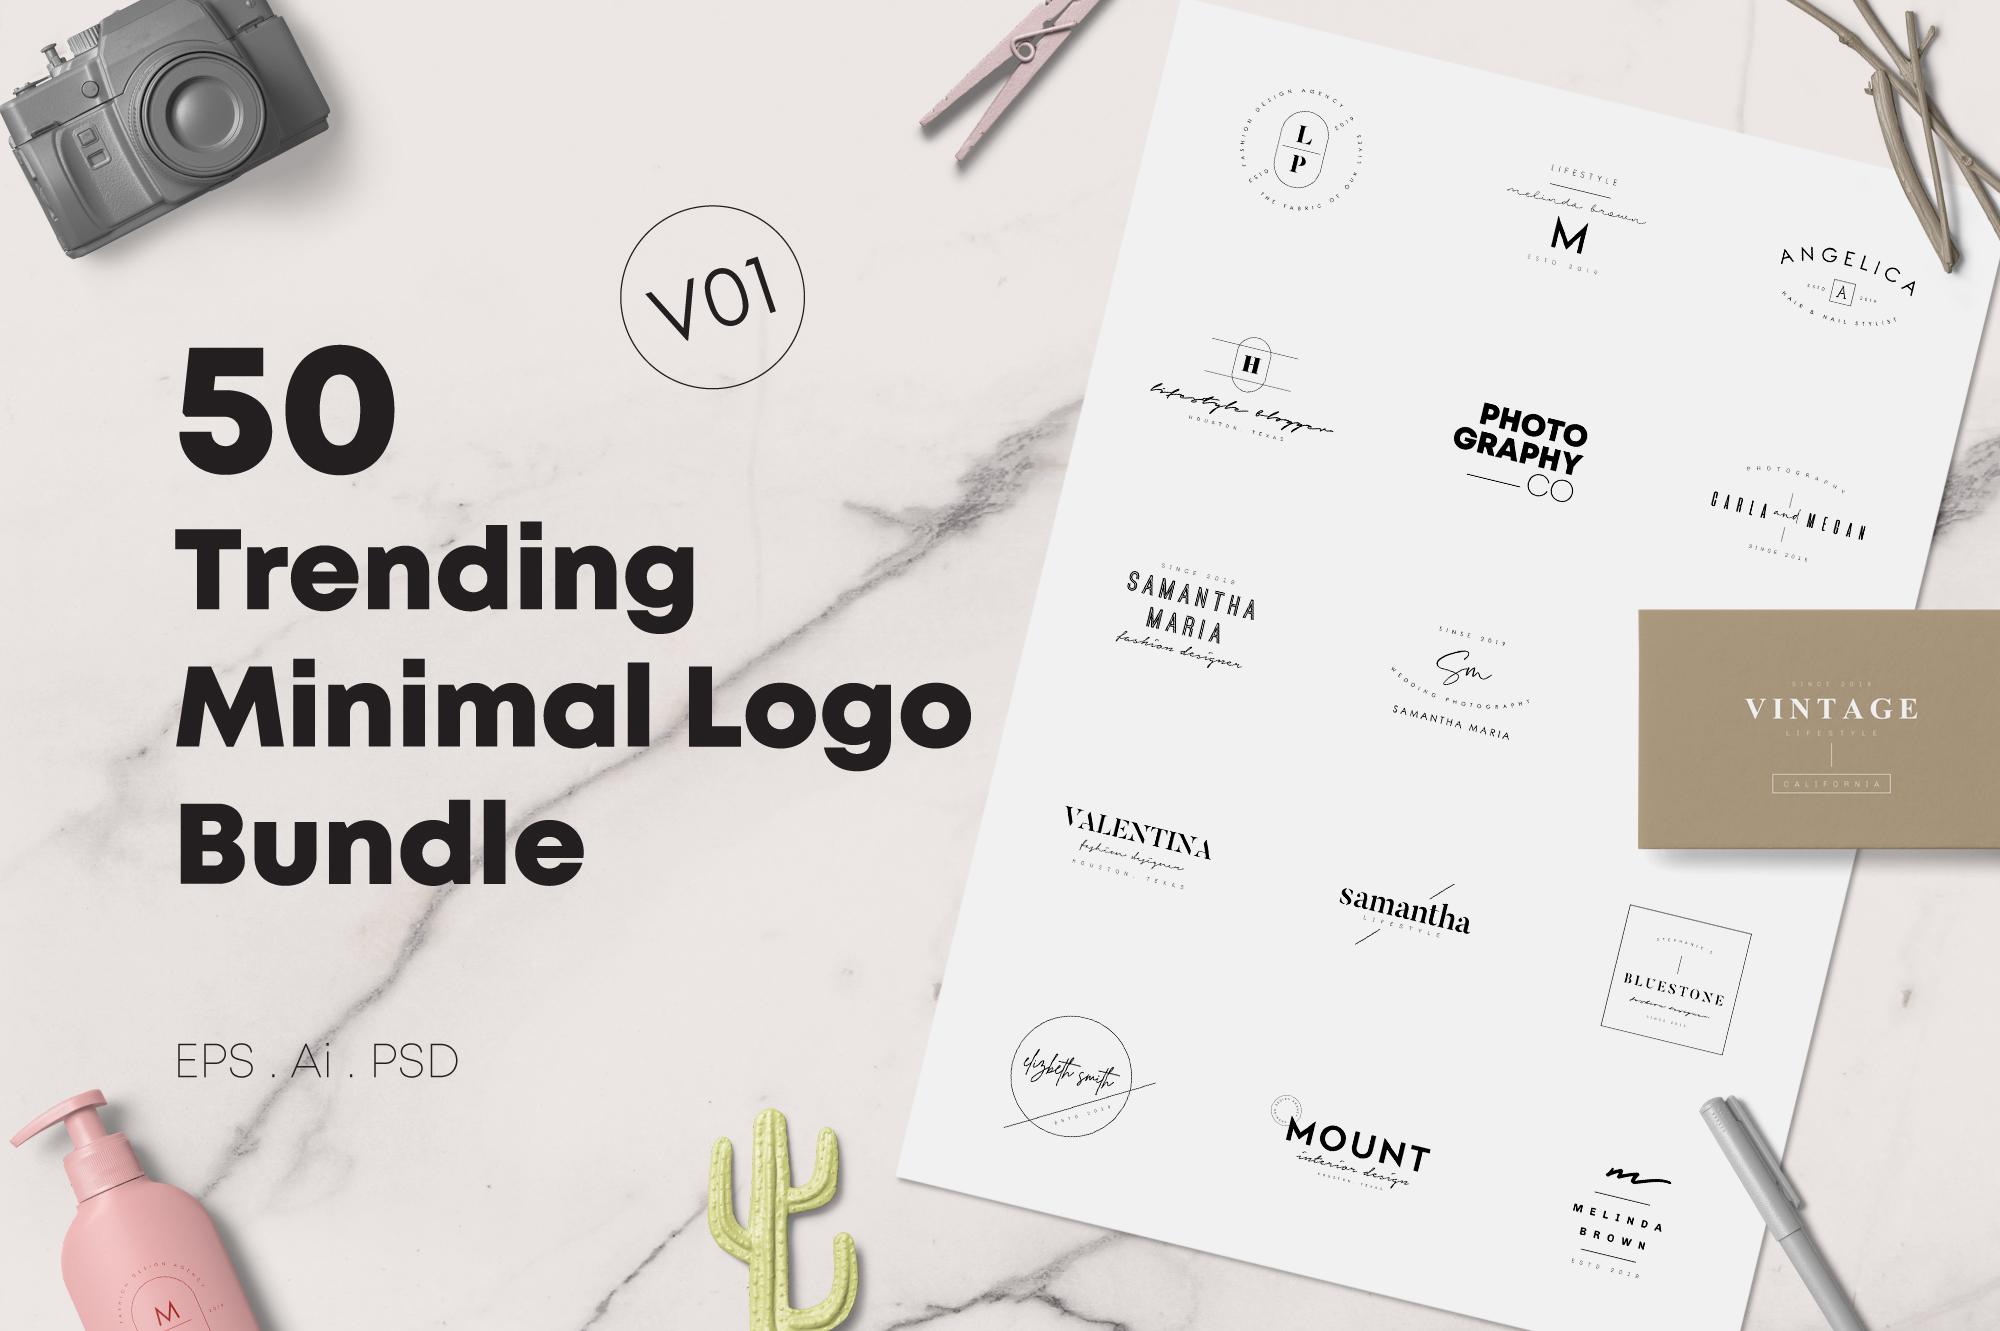 200 Trending Minimal Logo Bundle example image 2